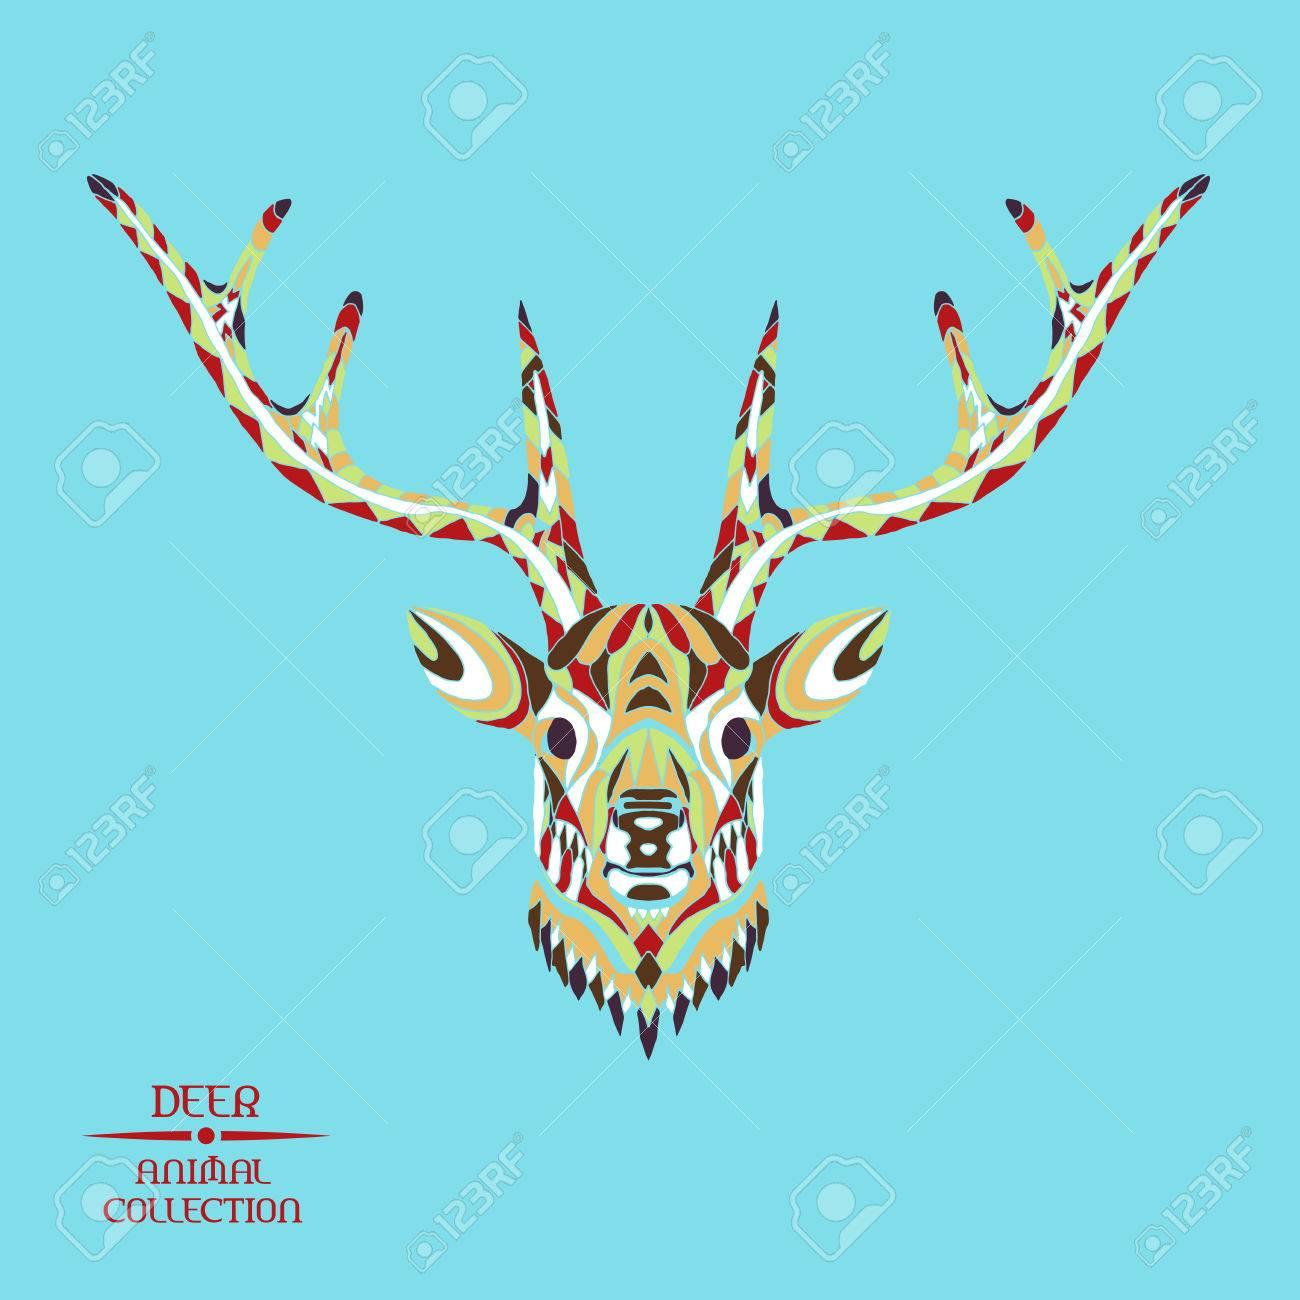 Zentangle Cabeza De Venado Estilizado Colección Animal Dibujado A